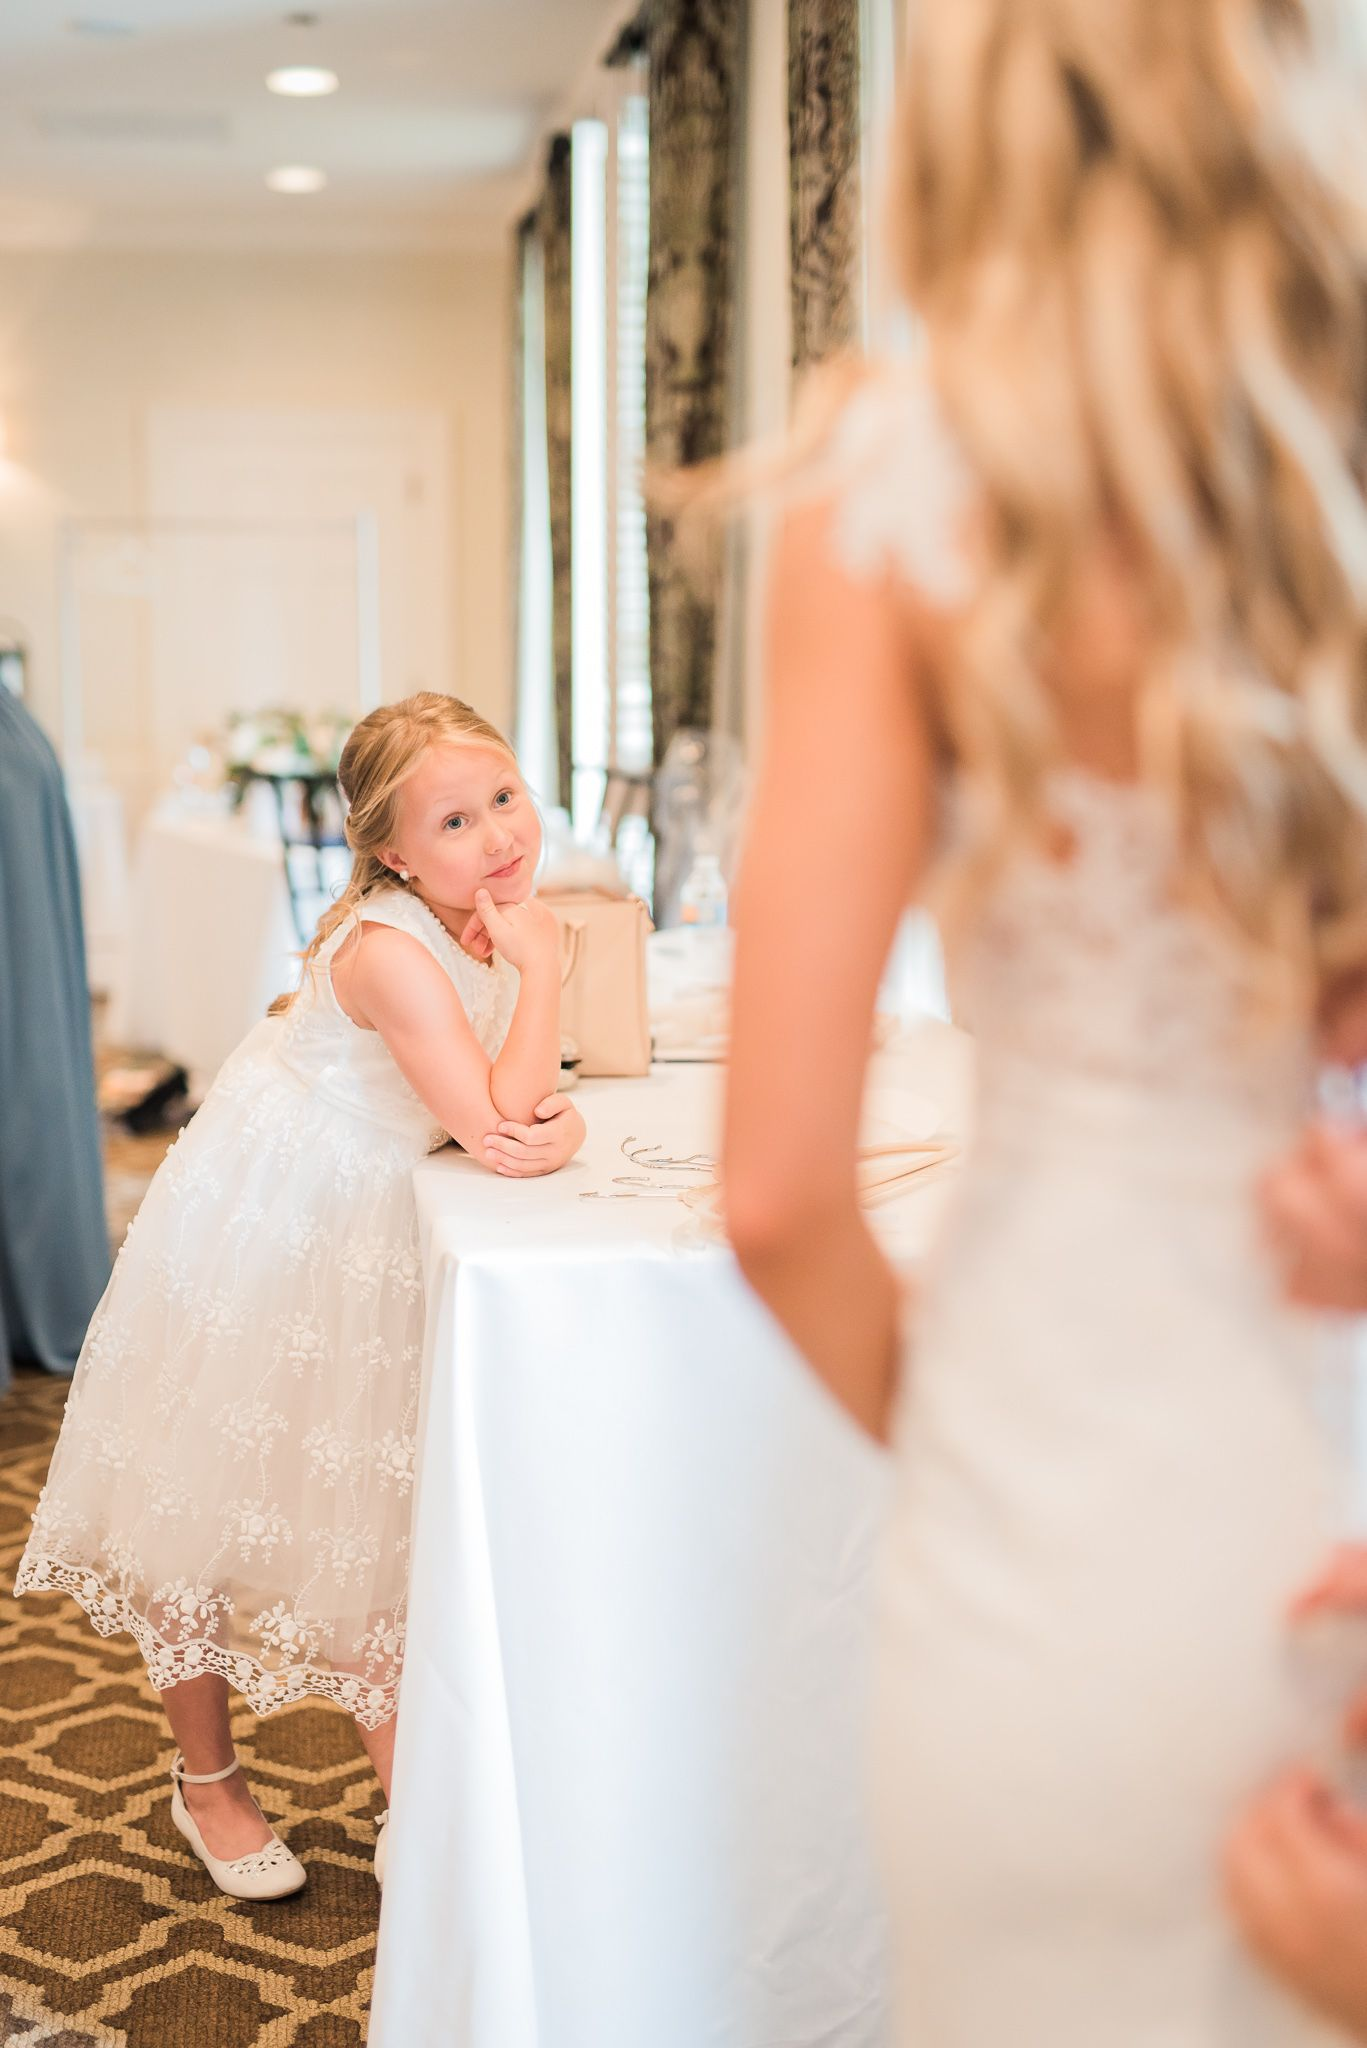 A River Oaks Country Club Houston Texas Wedding Texas Weddings Wedding Photo Pictures Socal Wedding